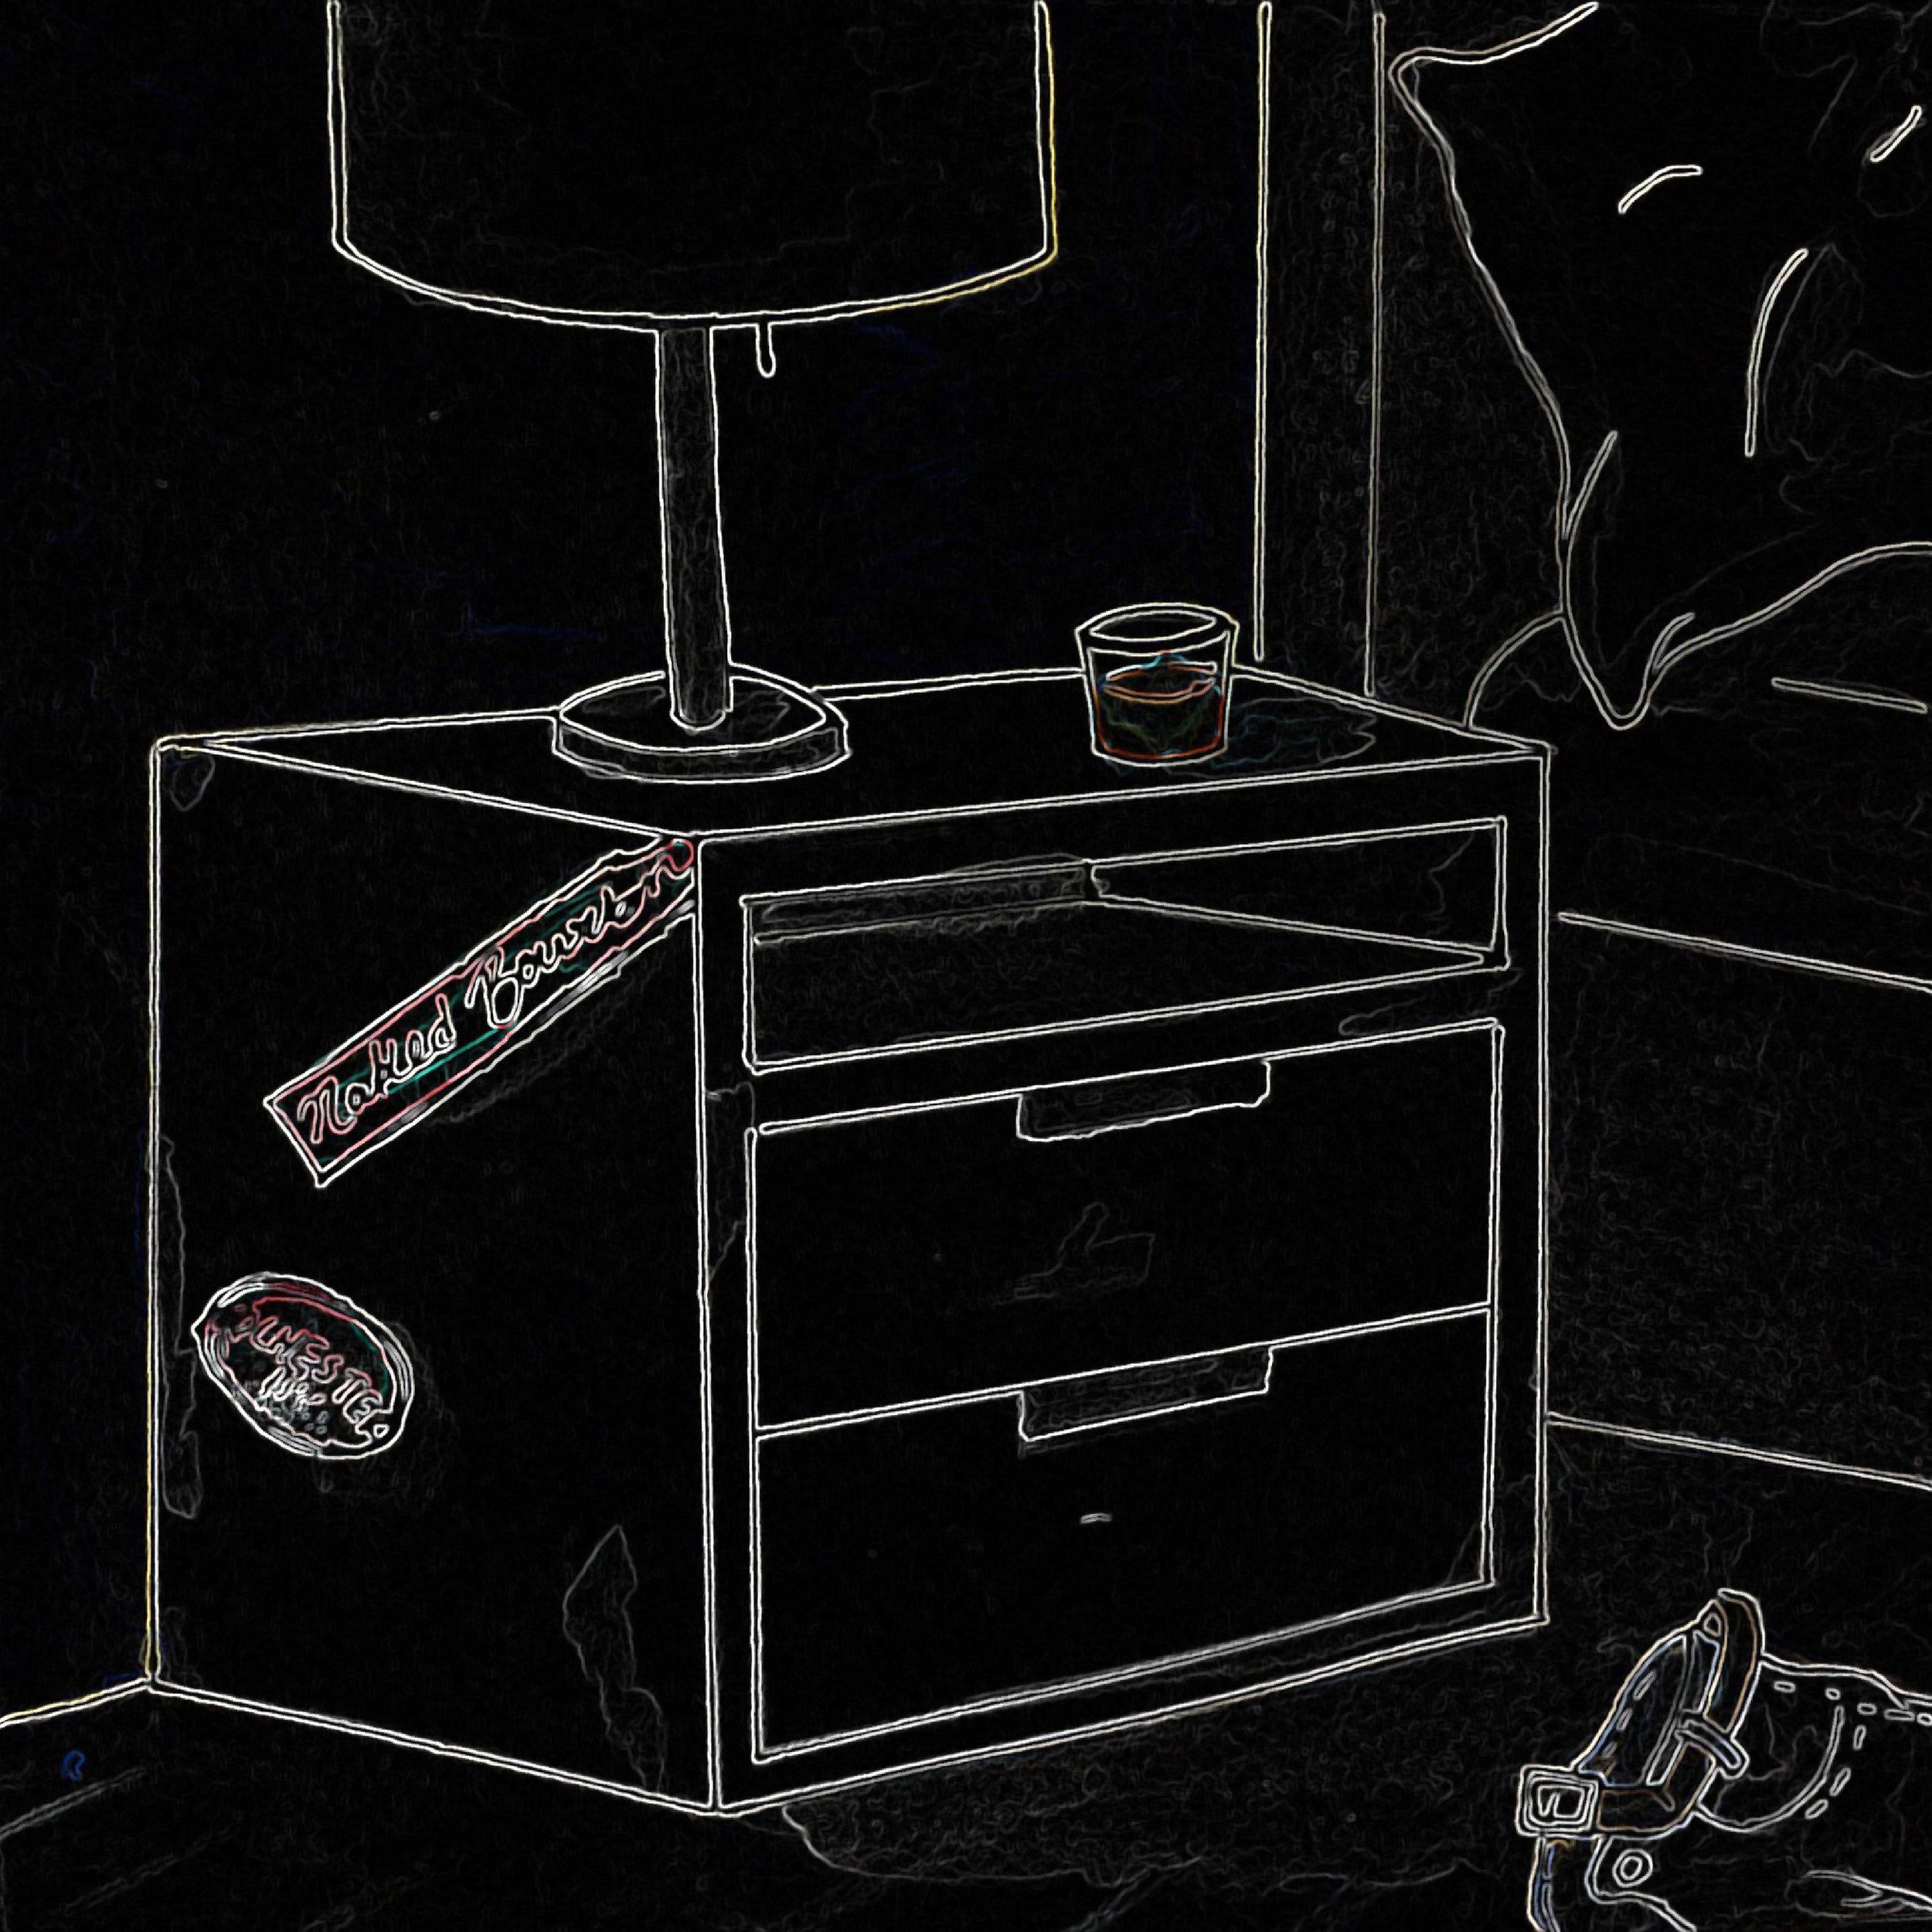 Naked Bourbon (EP, 2018)